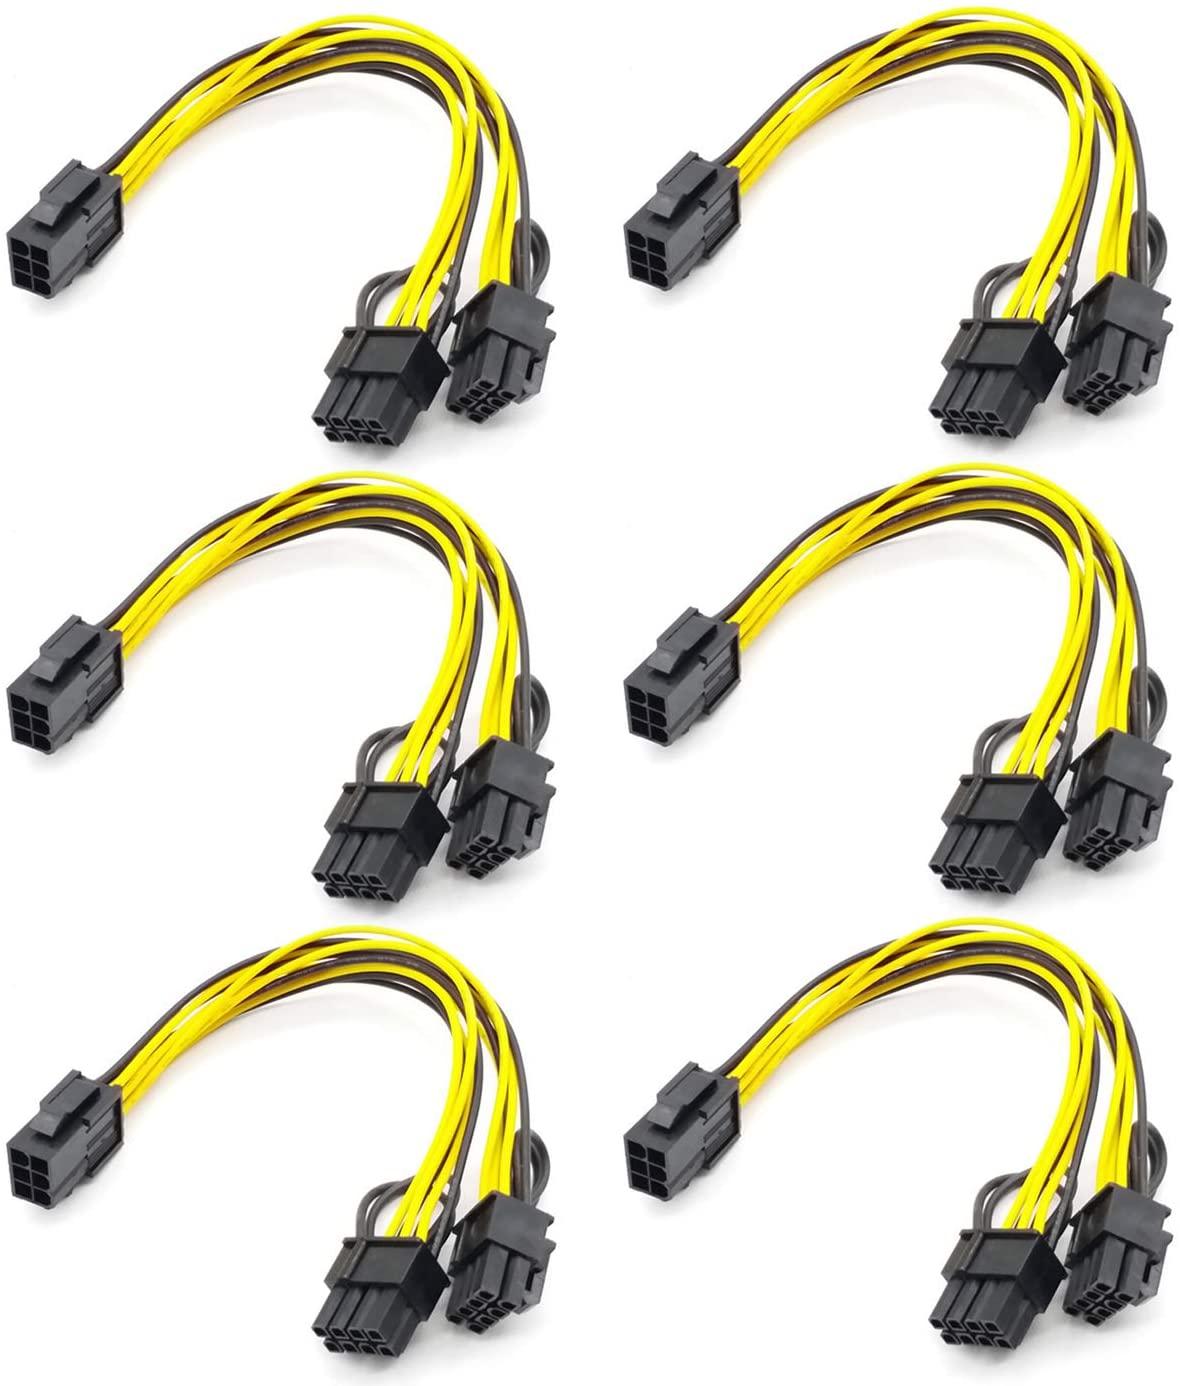 6 12pcs pci e adapter cable 6pin to dual 8pin splitter cable computer accessories pci e converter cord dropshipping supported 6PCS PCI-E 6-pin to Dual 6+2-pin (6-pin/8-pin) Power Splitter Cable Graphics Card PCIE PCI Express 6Pin to Dual 8Pin Power Cable